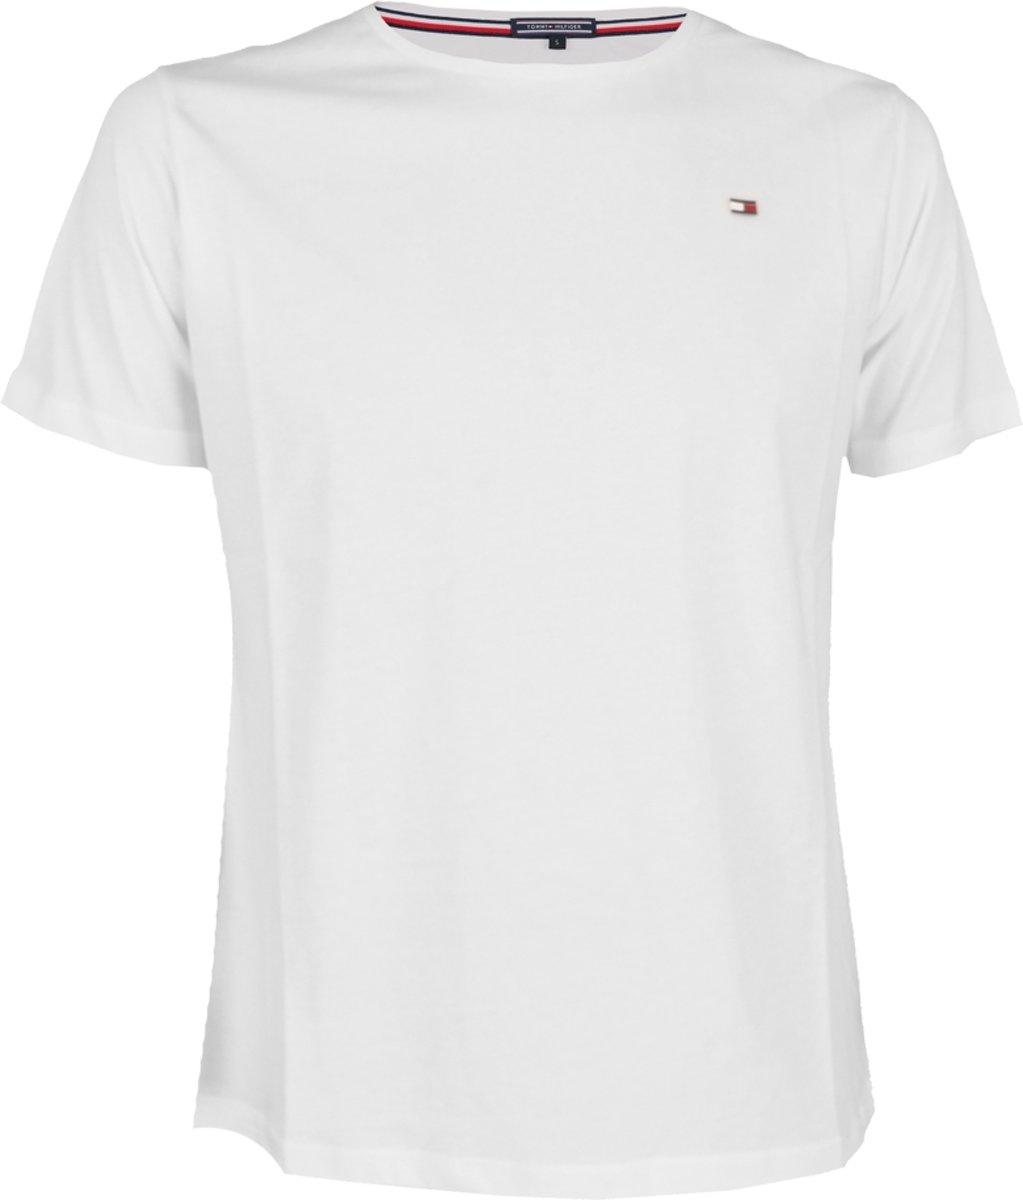 Tommy Hilfiger Icon Ronde Hals T Shirt Wit L